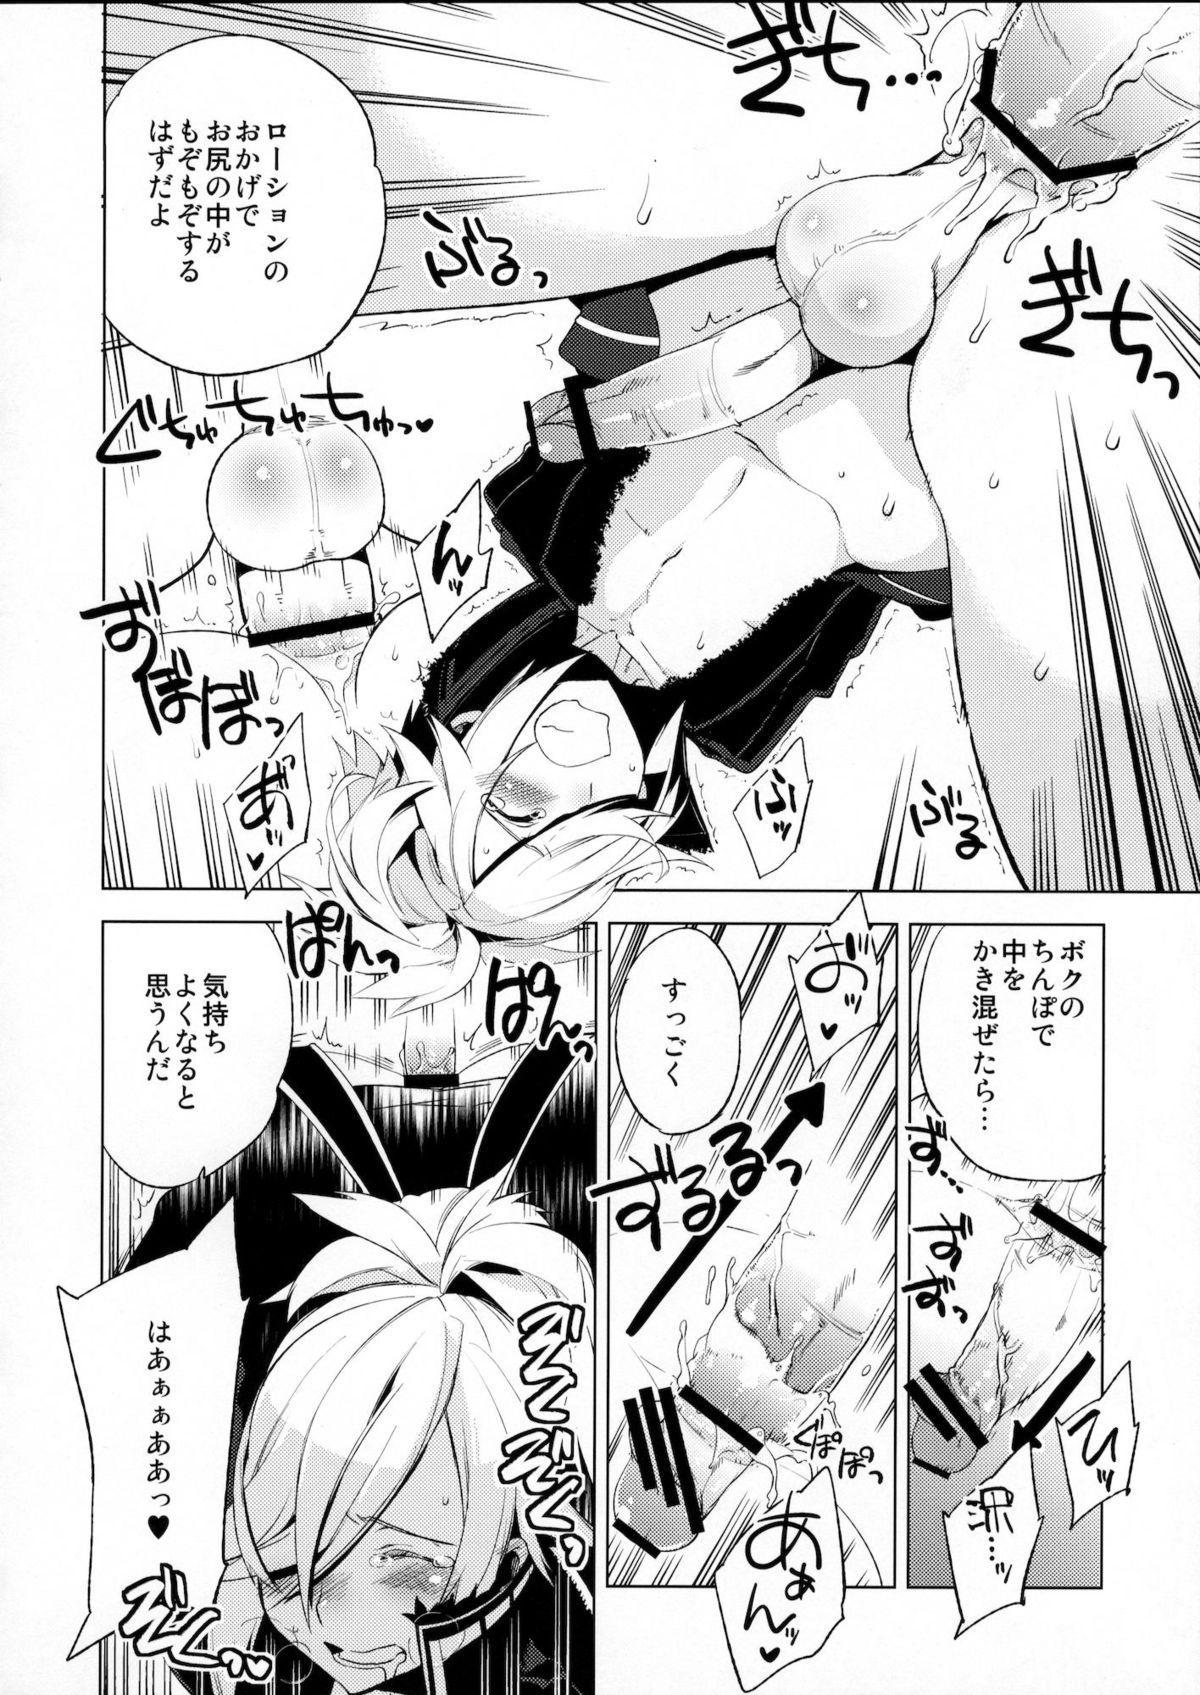 Korizu ni Josou Shounen Hon 6 Sizzle Infinity! 12